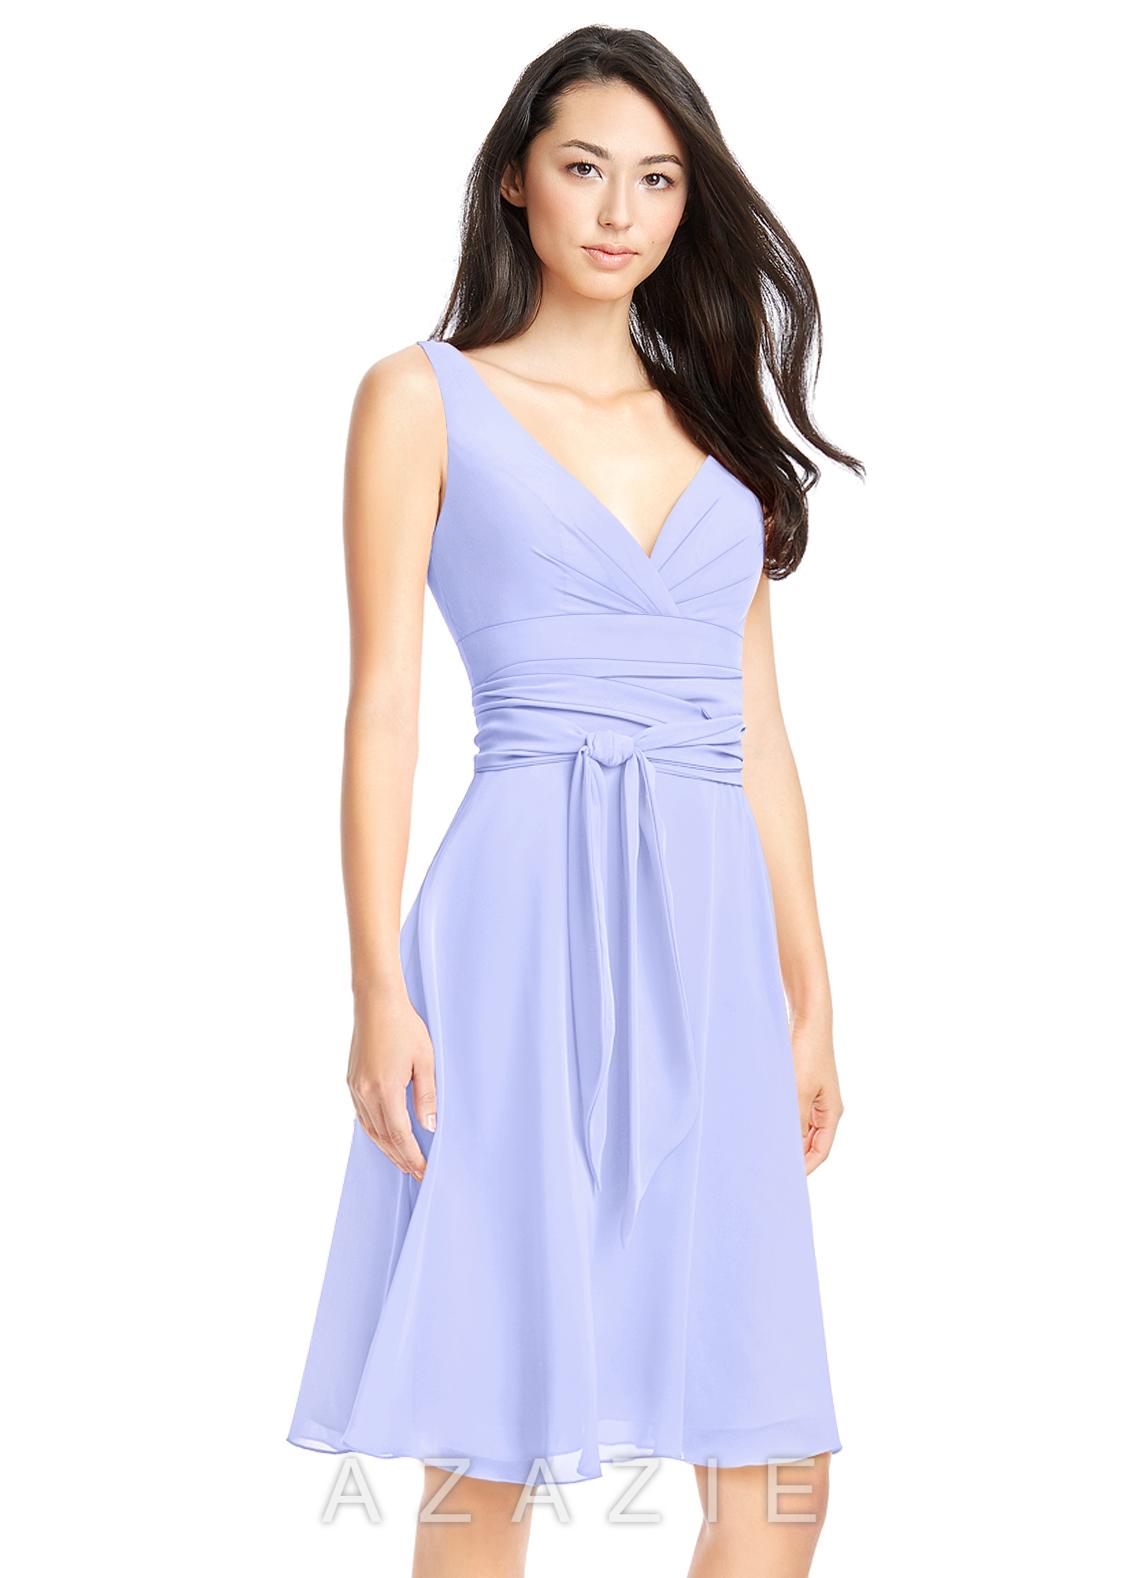 Azazie Ginger JBD Junior Bridesmaid Dresses | Azazie